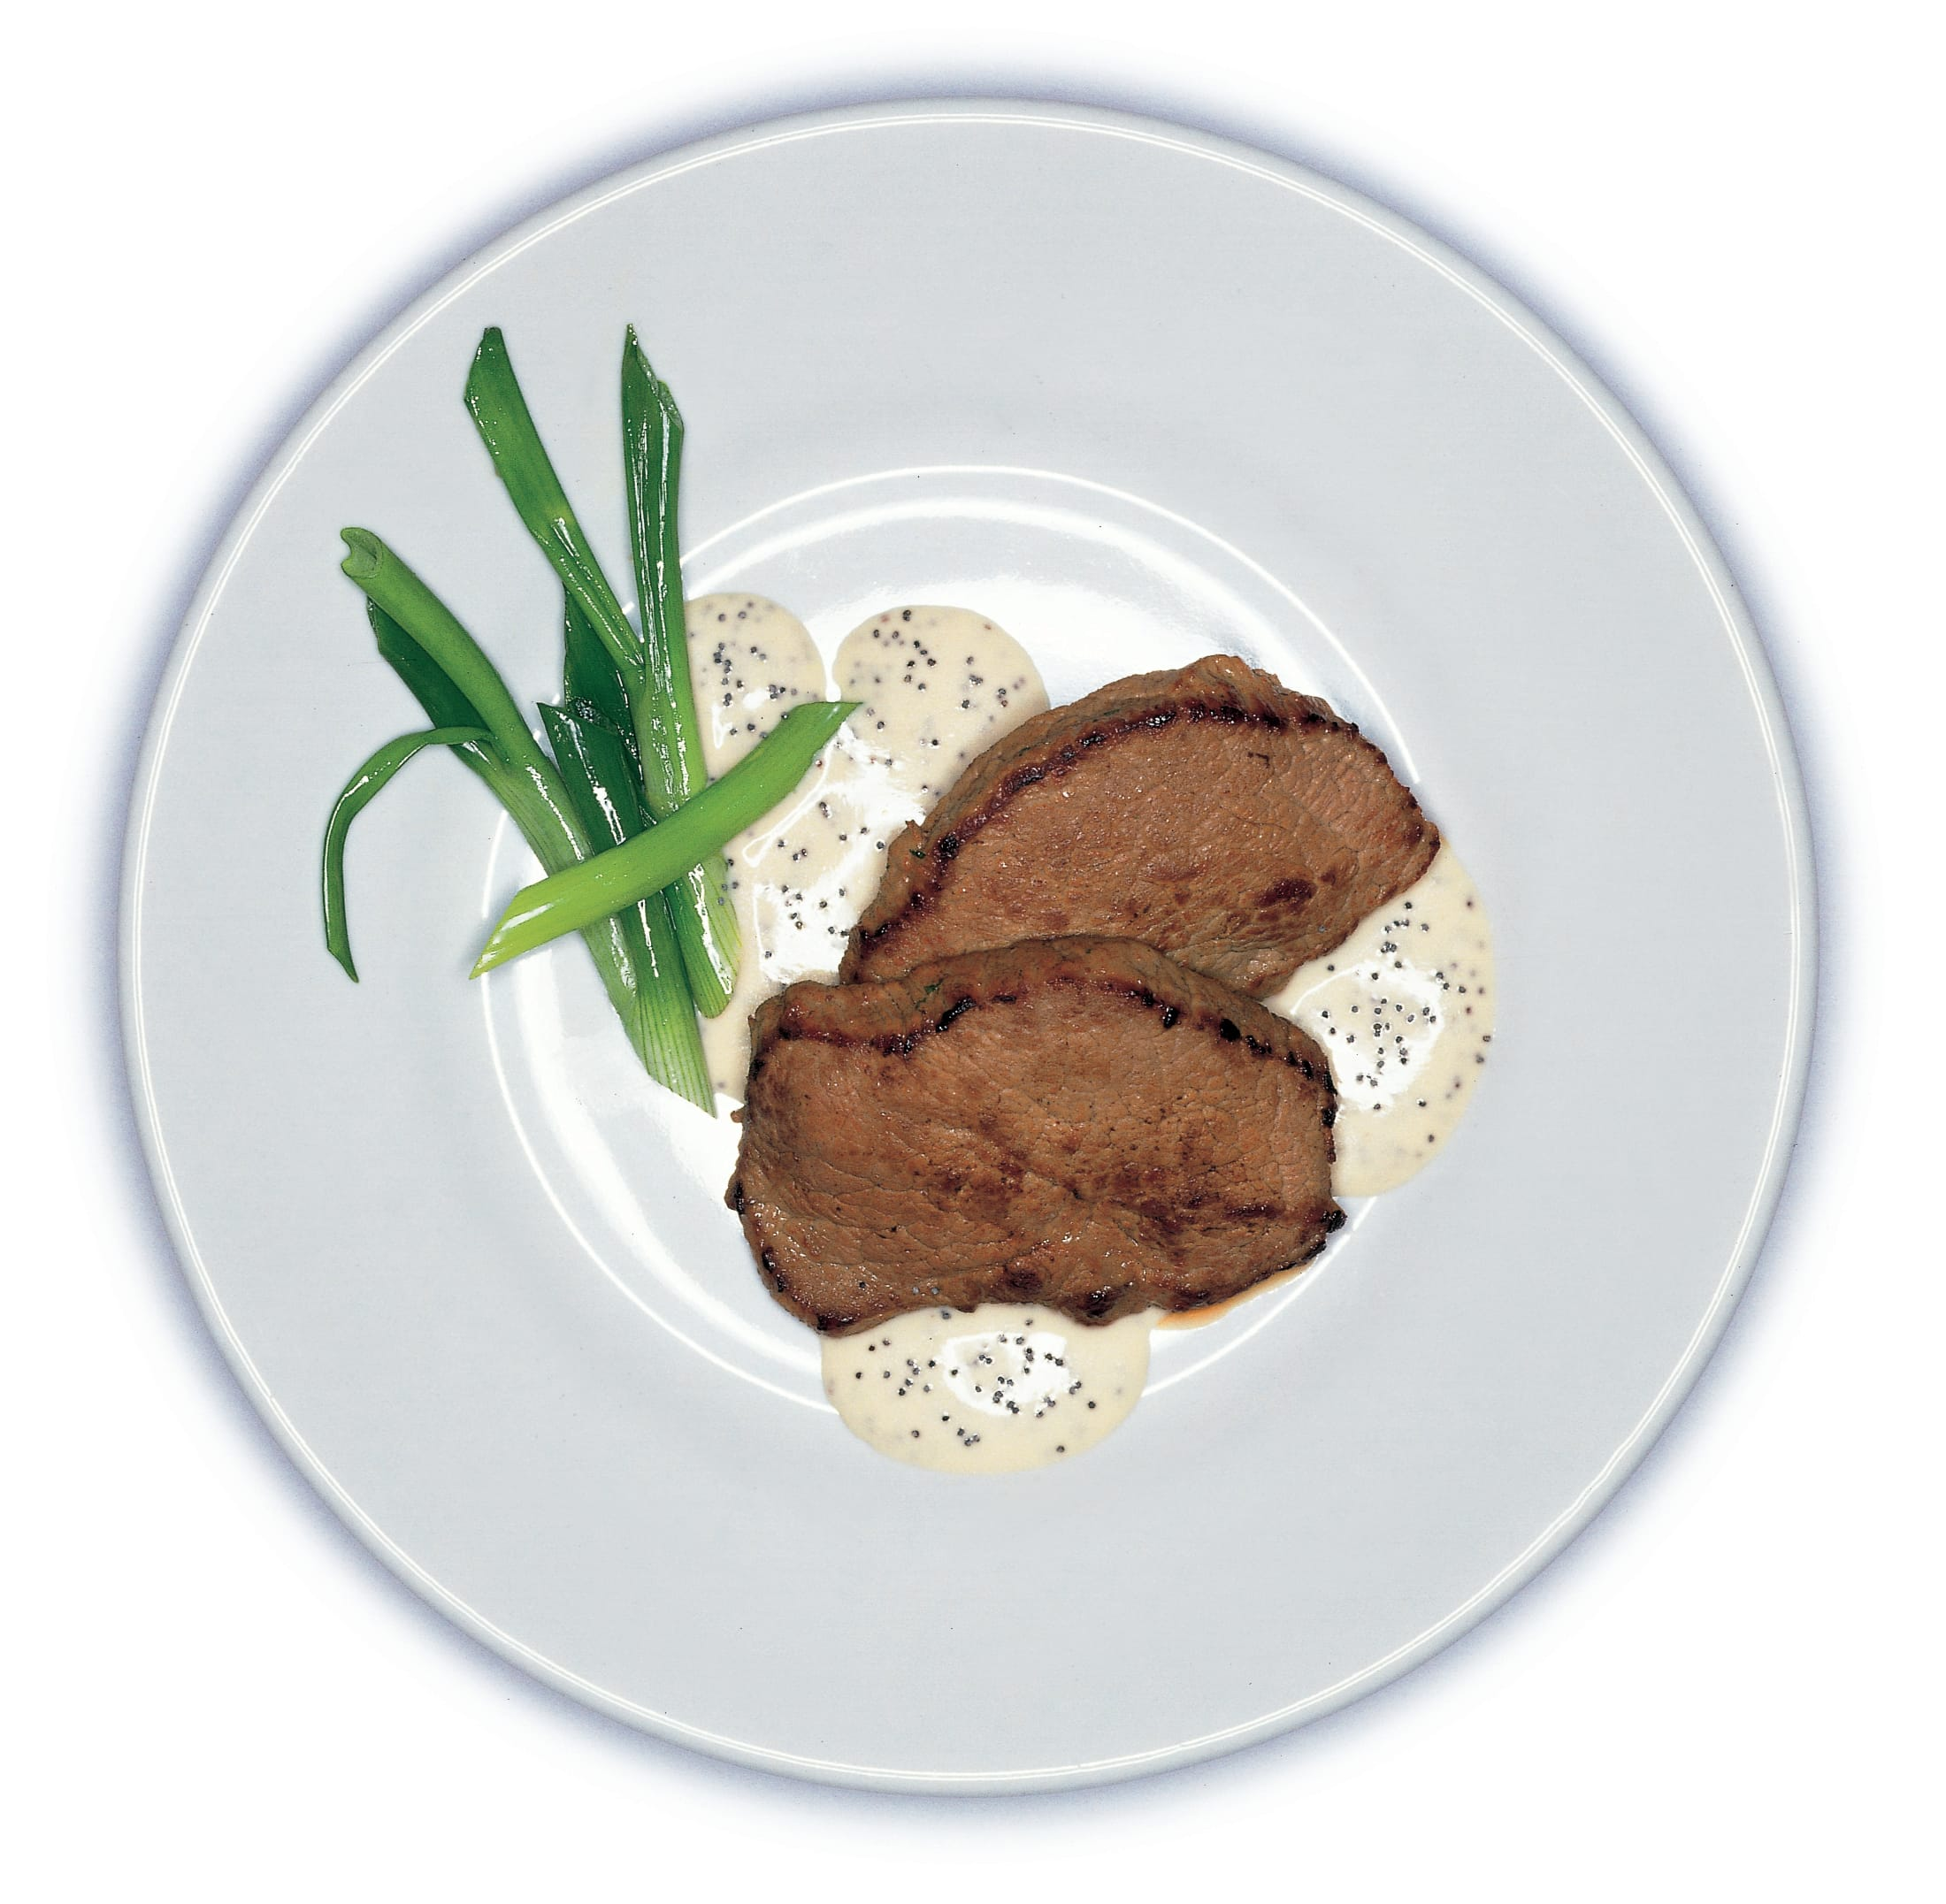 Kalbsschnitzel mit Mohnsauce